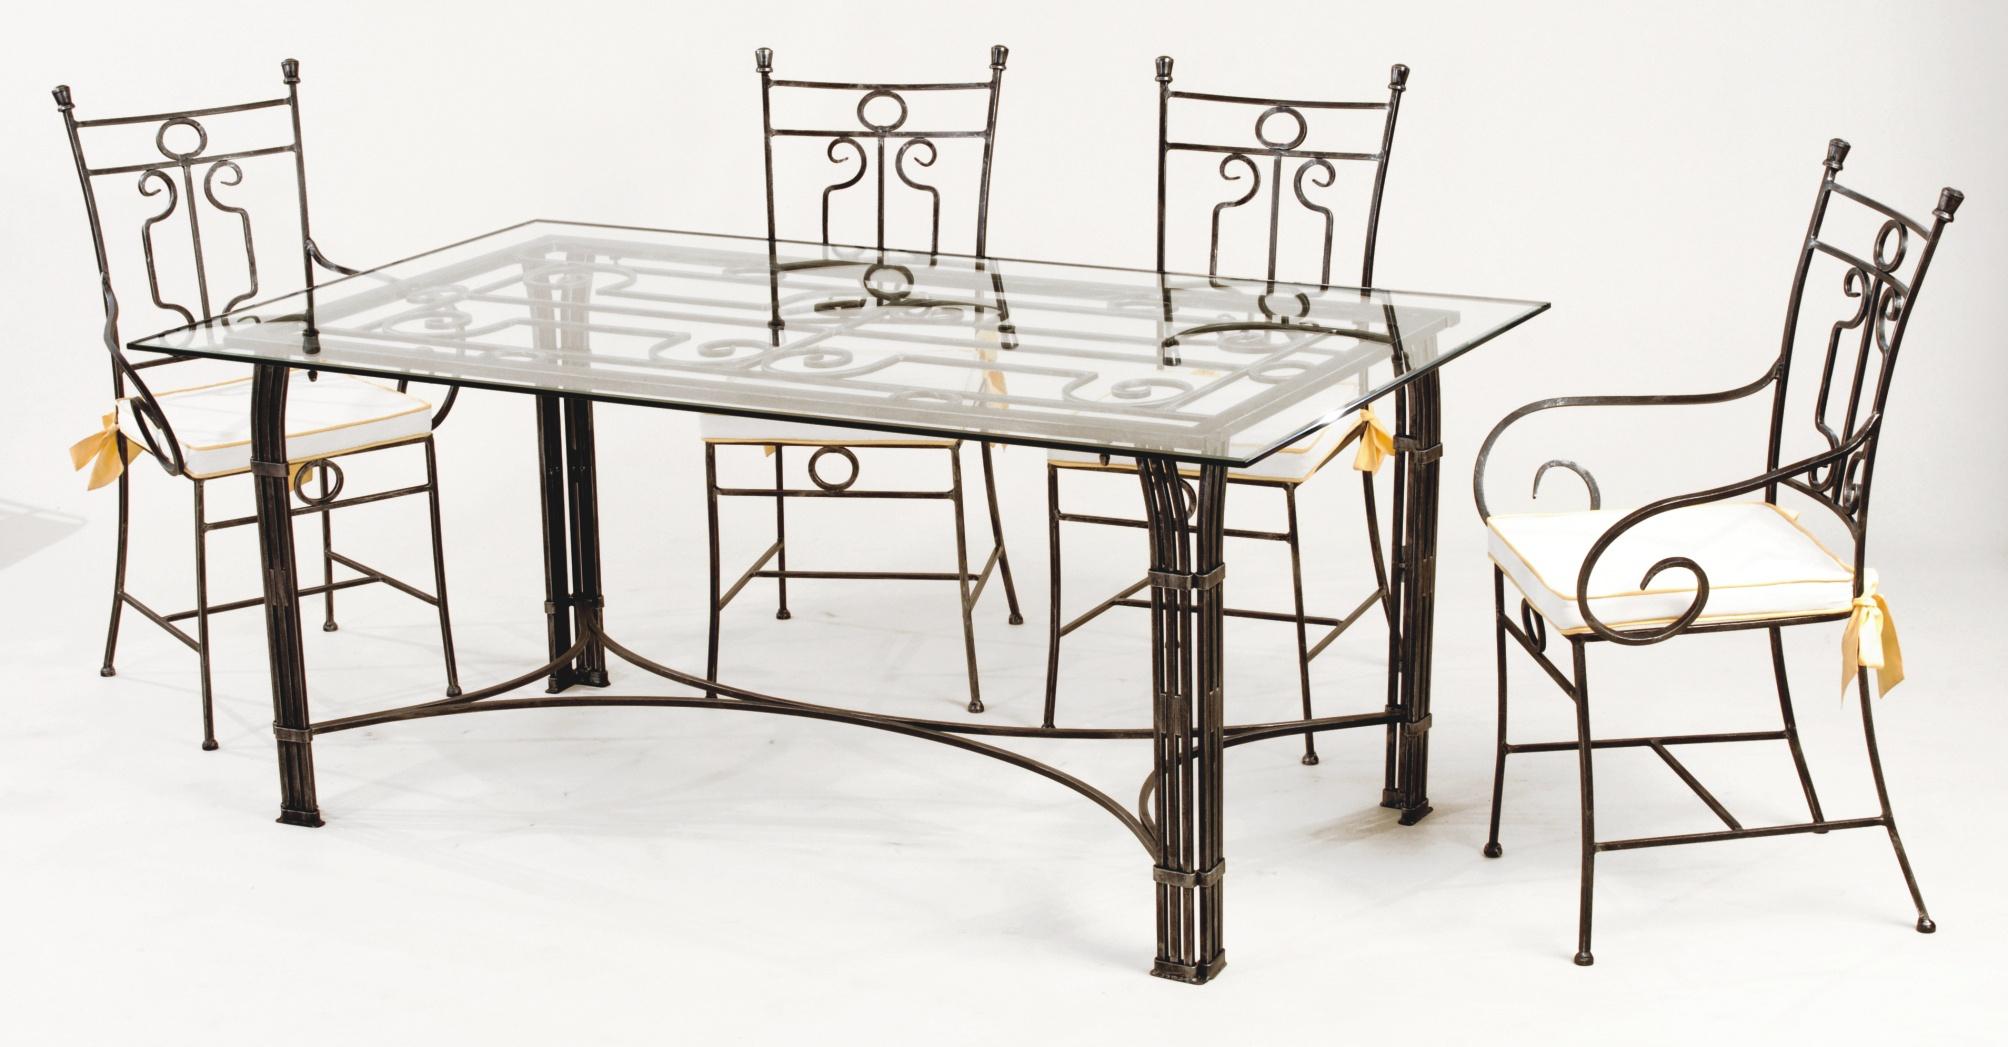 Table Et Chaises Fer Forgé Vivaldi concernant Table Salle A Manger En Fer Forgé